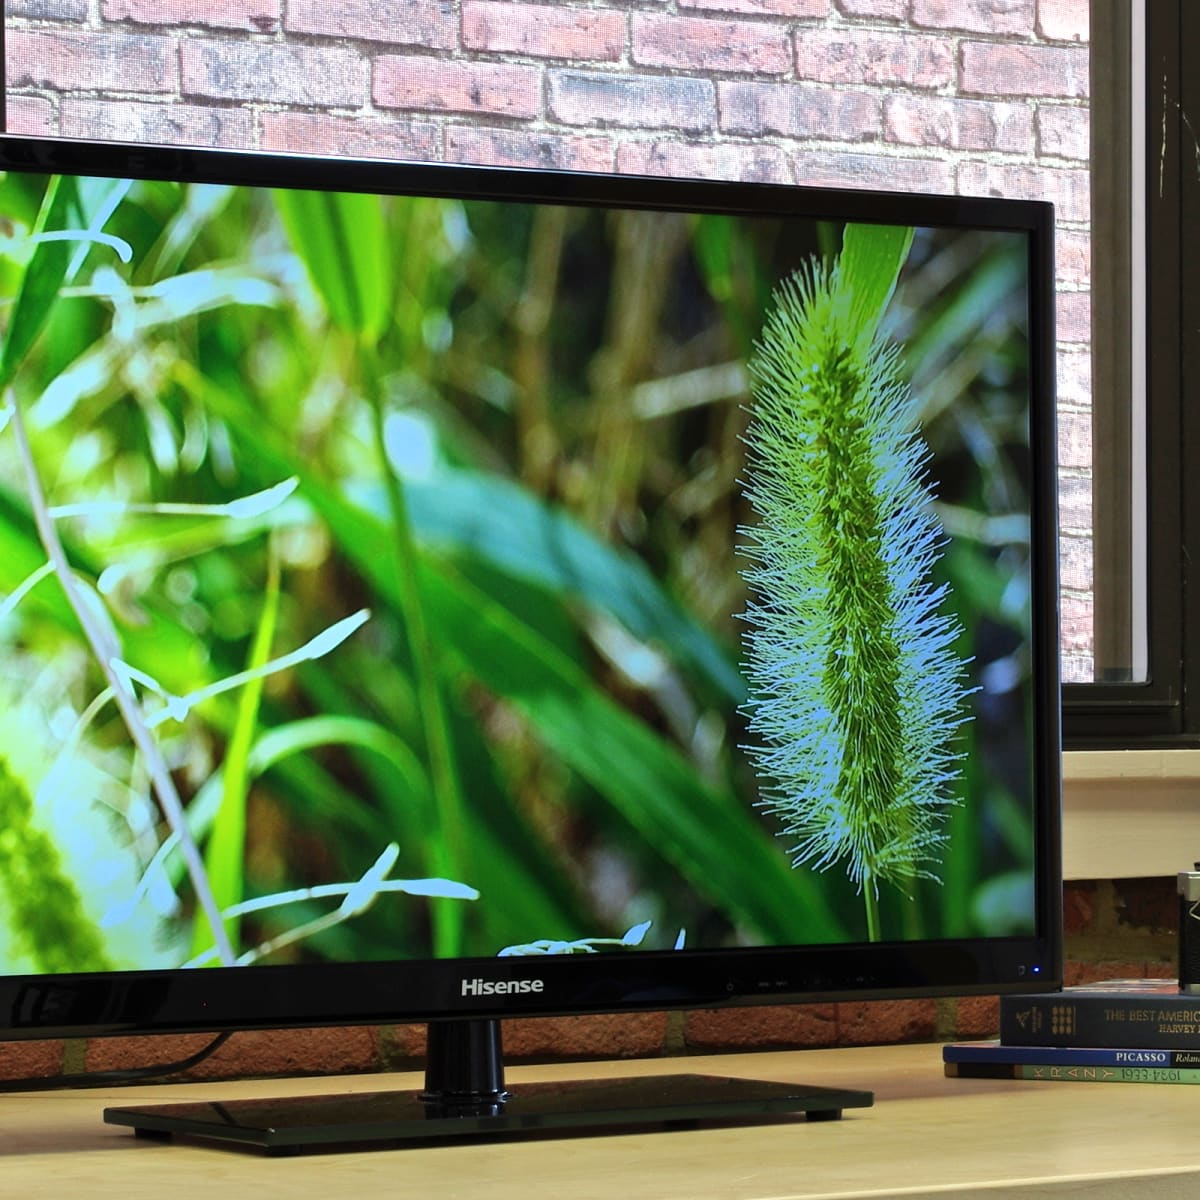 Hisense 32H3 LED TV Review - Reviewed Televisions